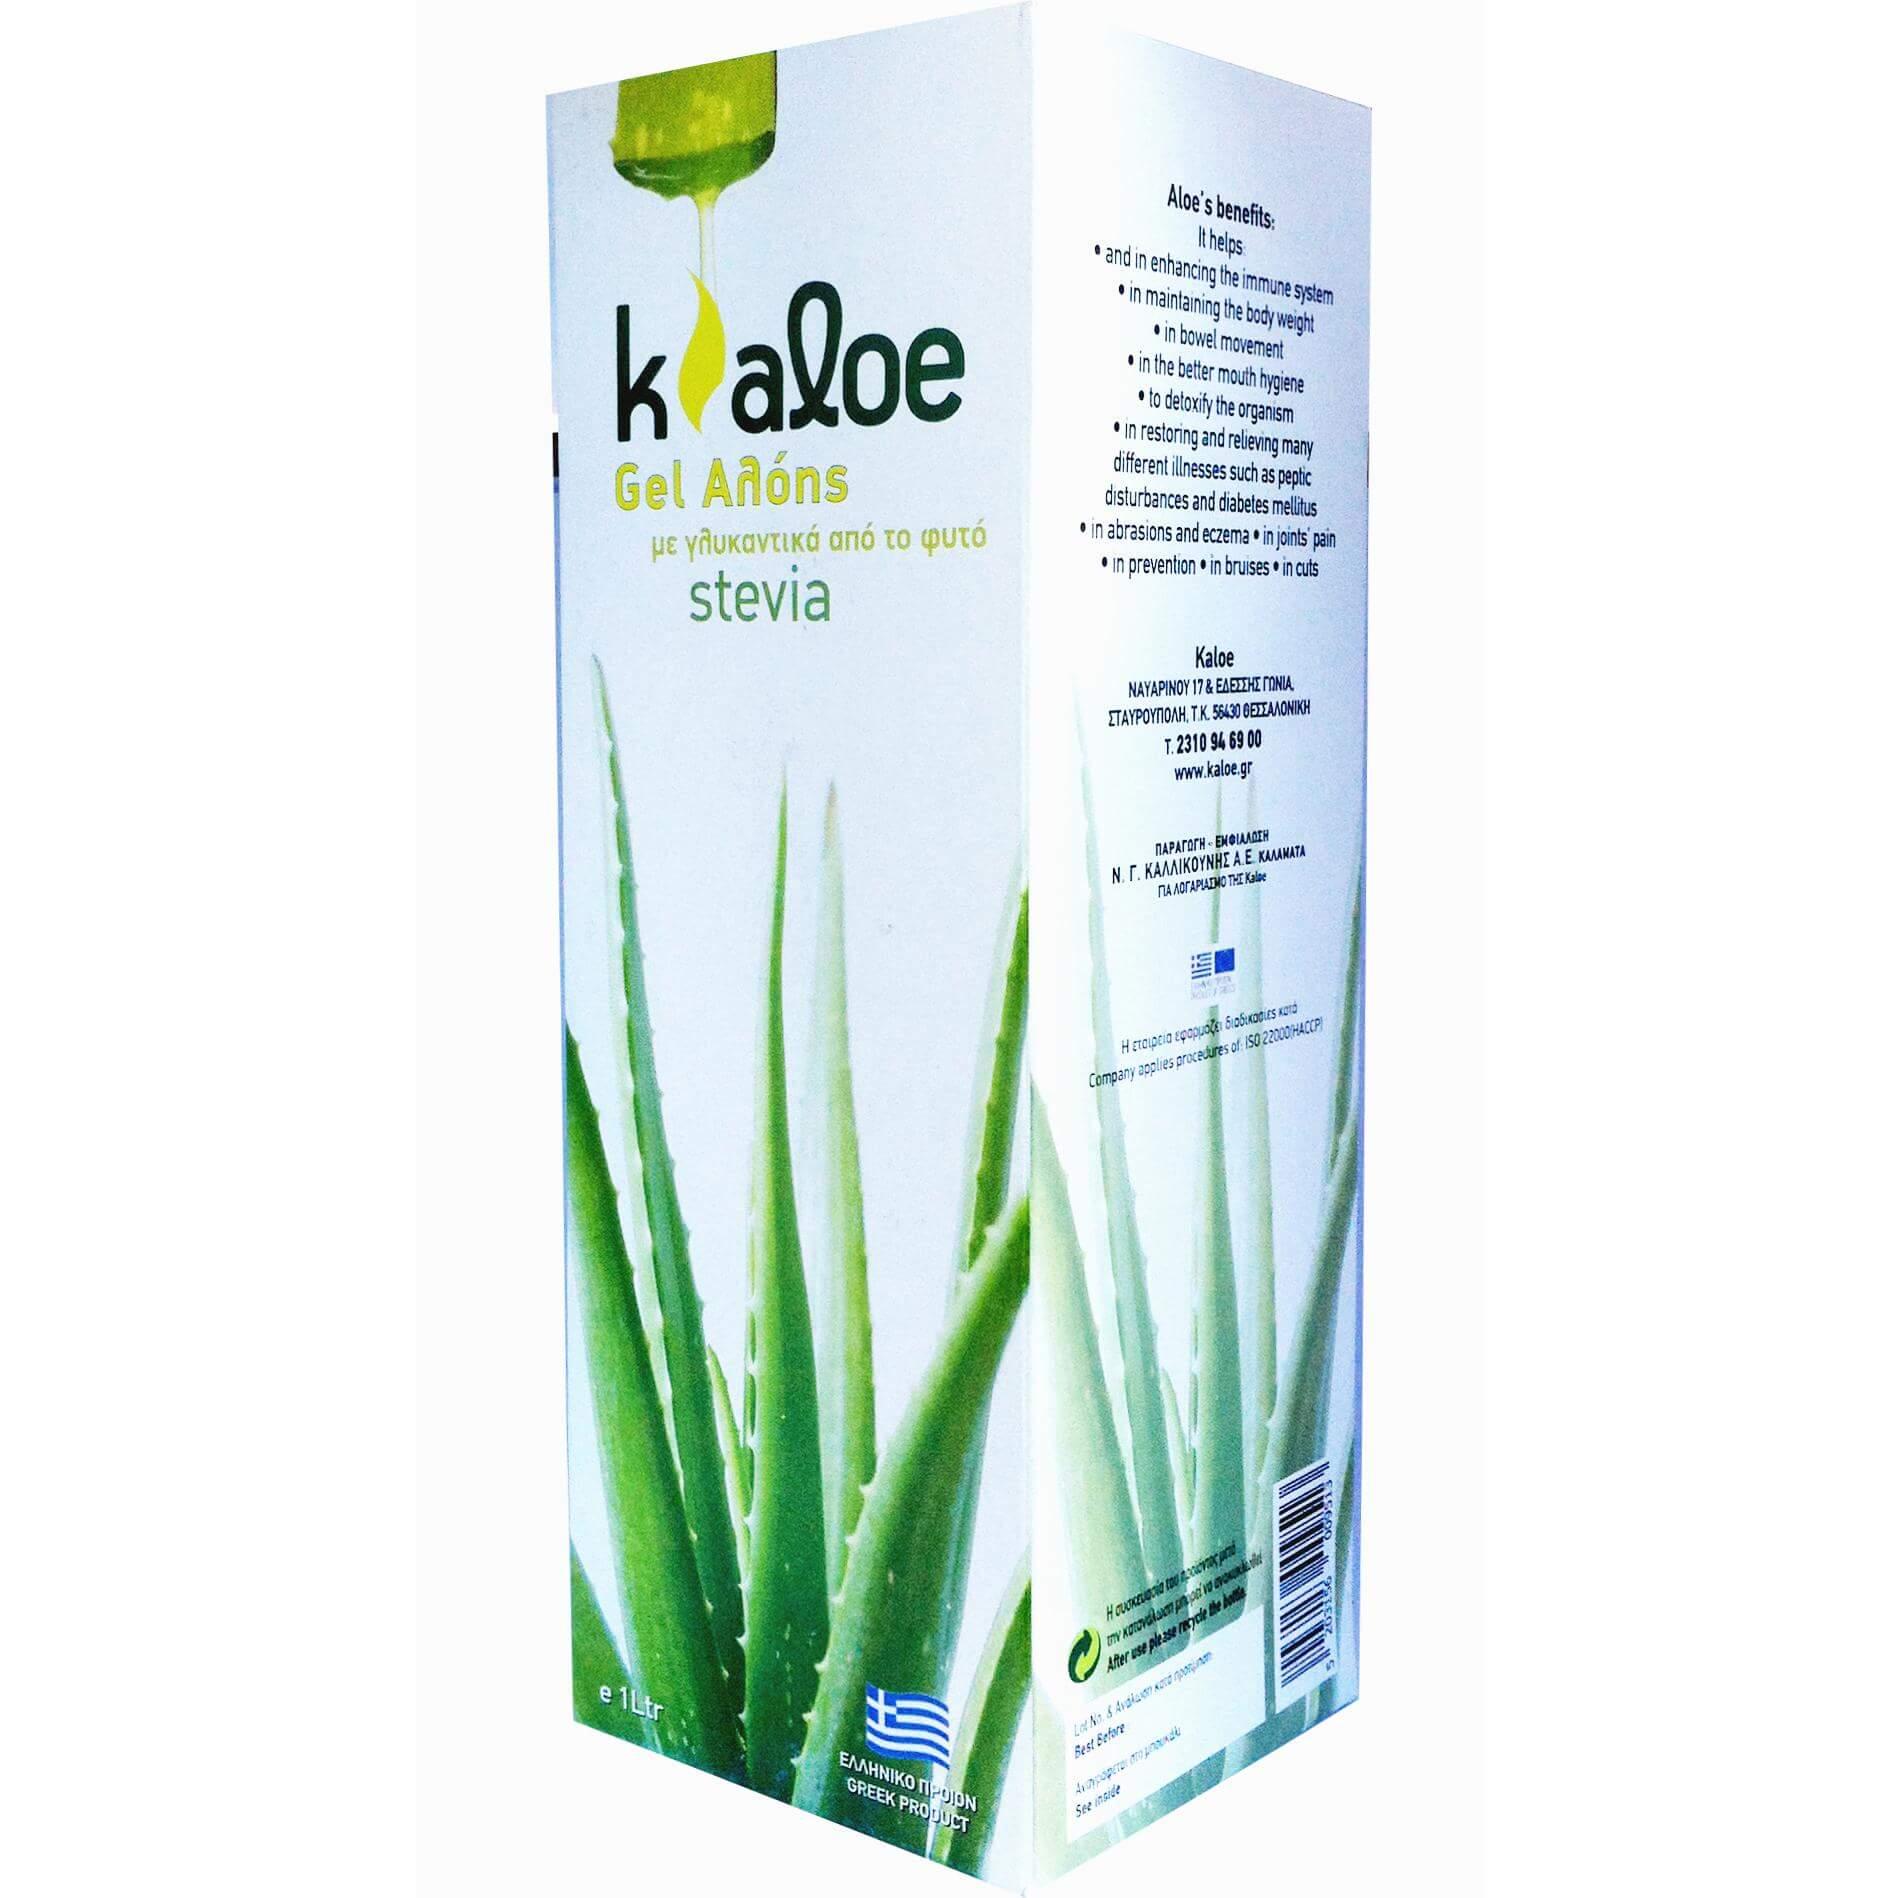 Kaloe Gel Αλόης Φυσικός Χυμός Βιολογικής Αλόης & Γλυκαντικά Από το Φυτό Stevia 1Lt